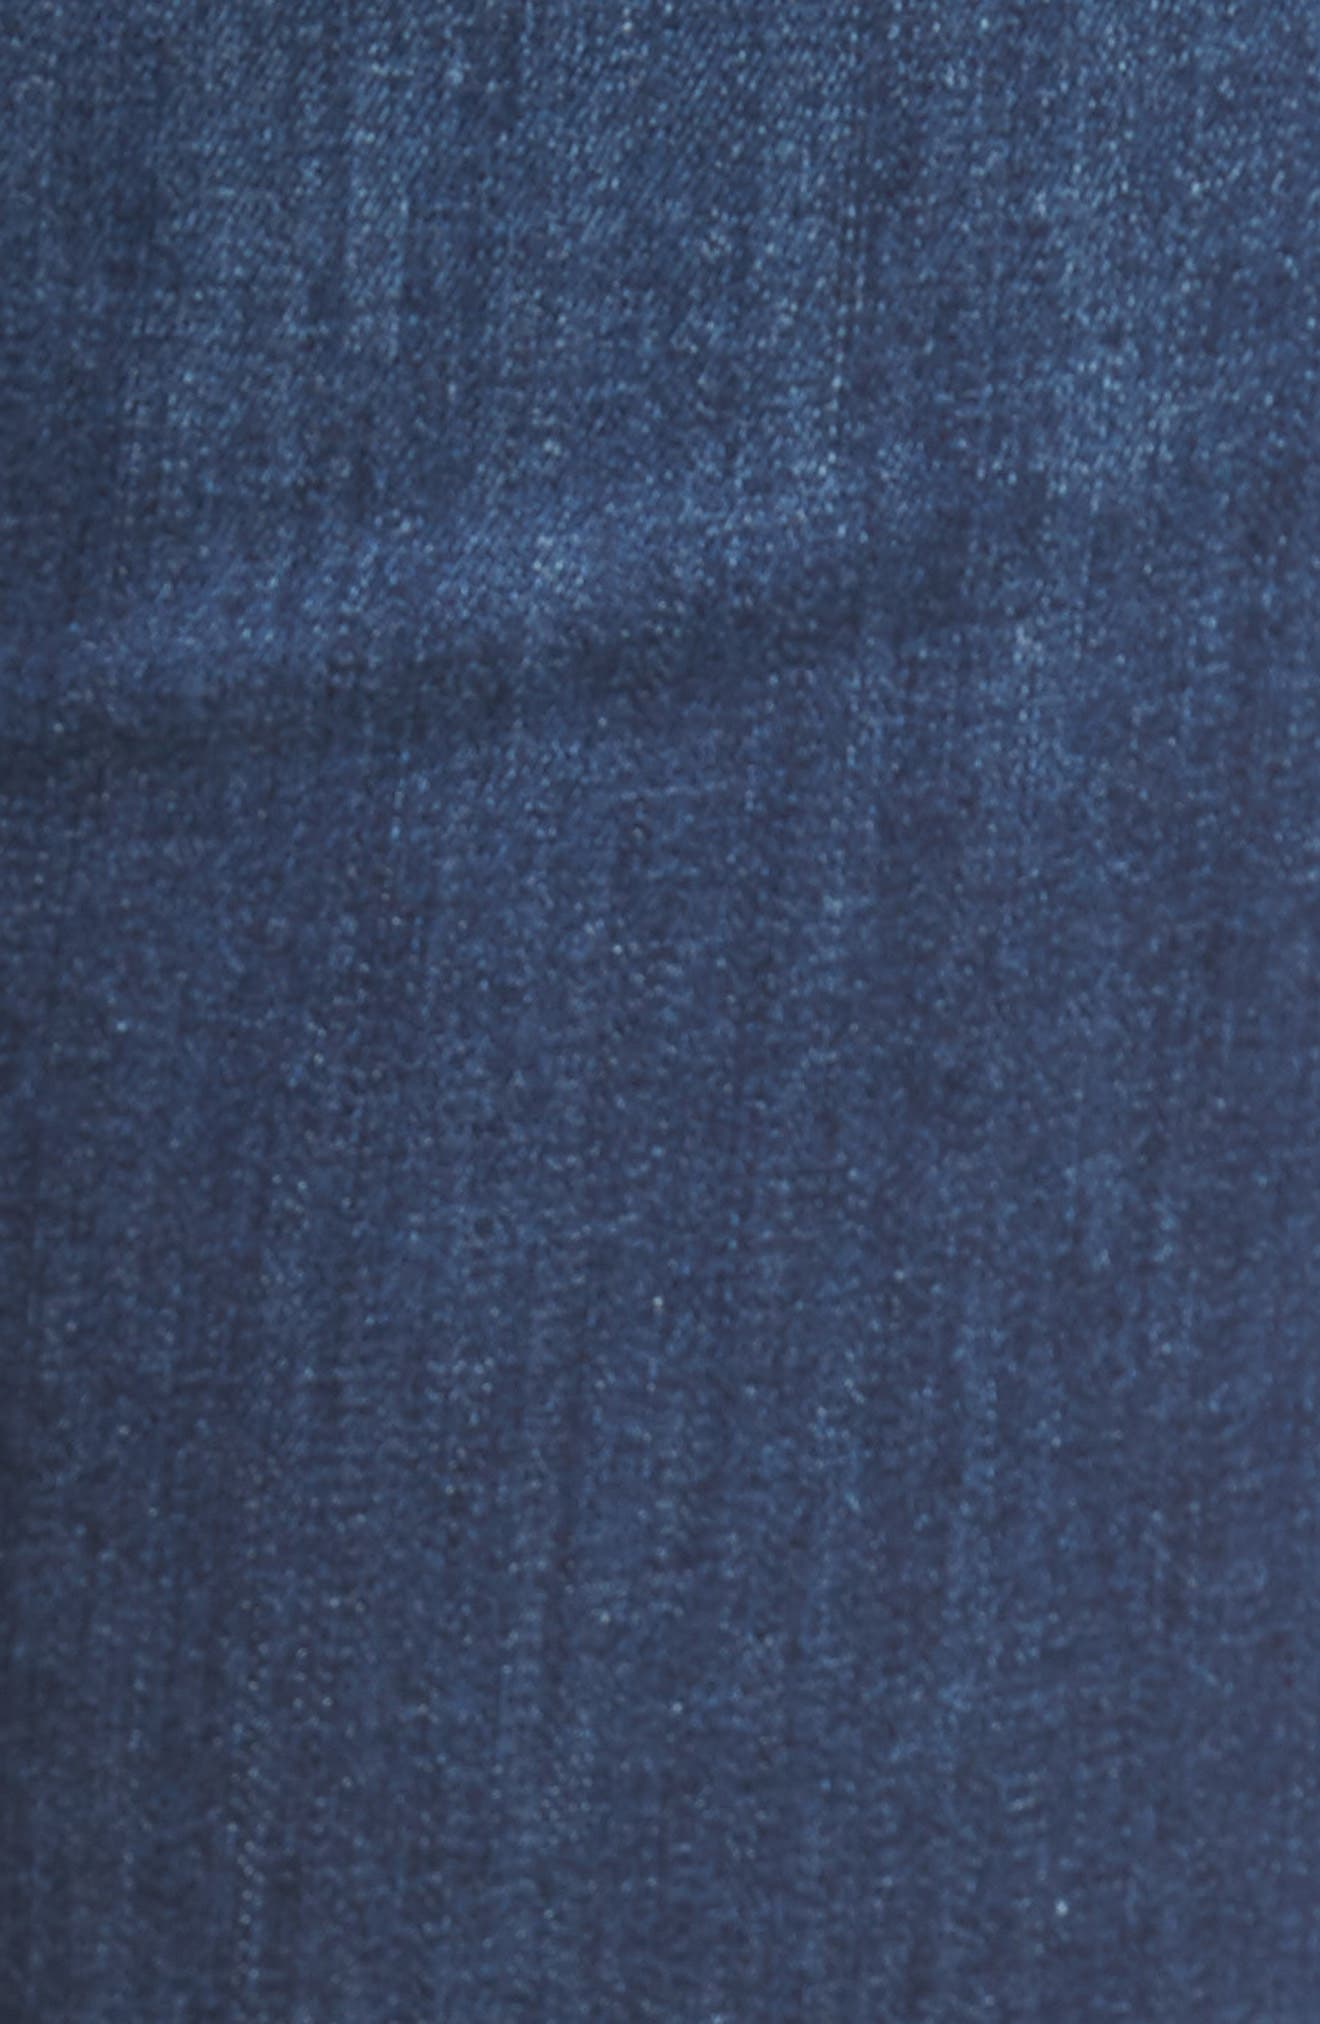 Alissa Super Skinny Jeans,                             Alternate thumbnail 5, color,                             401